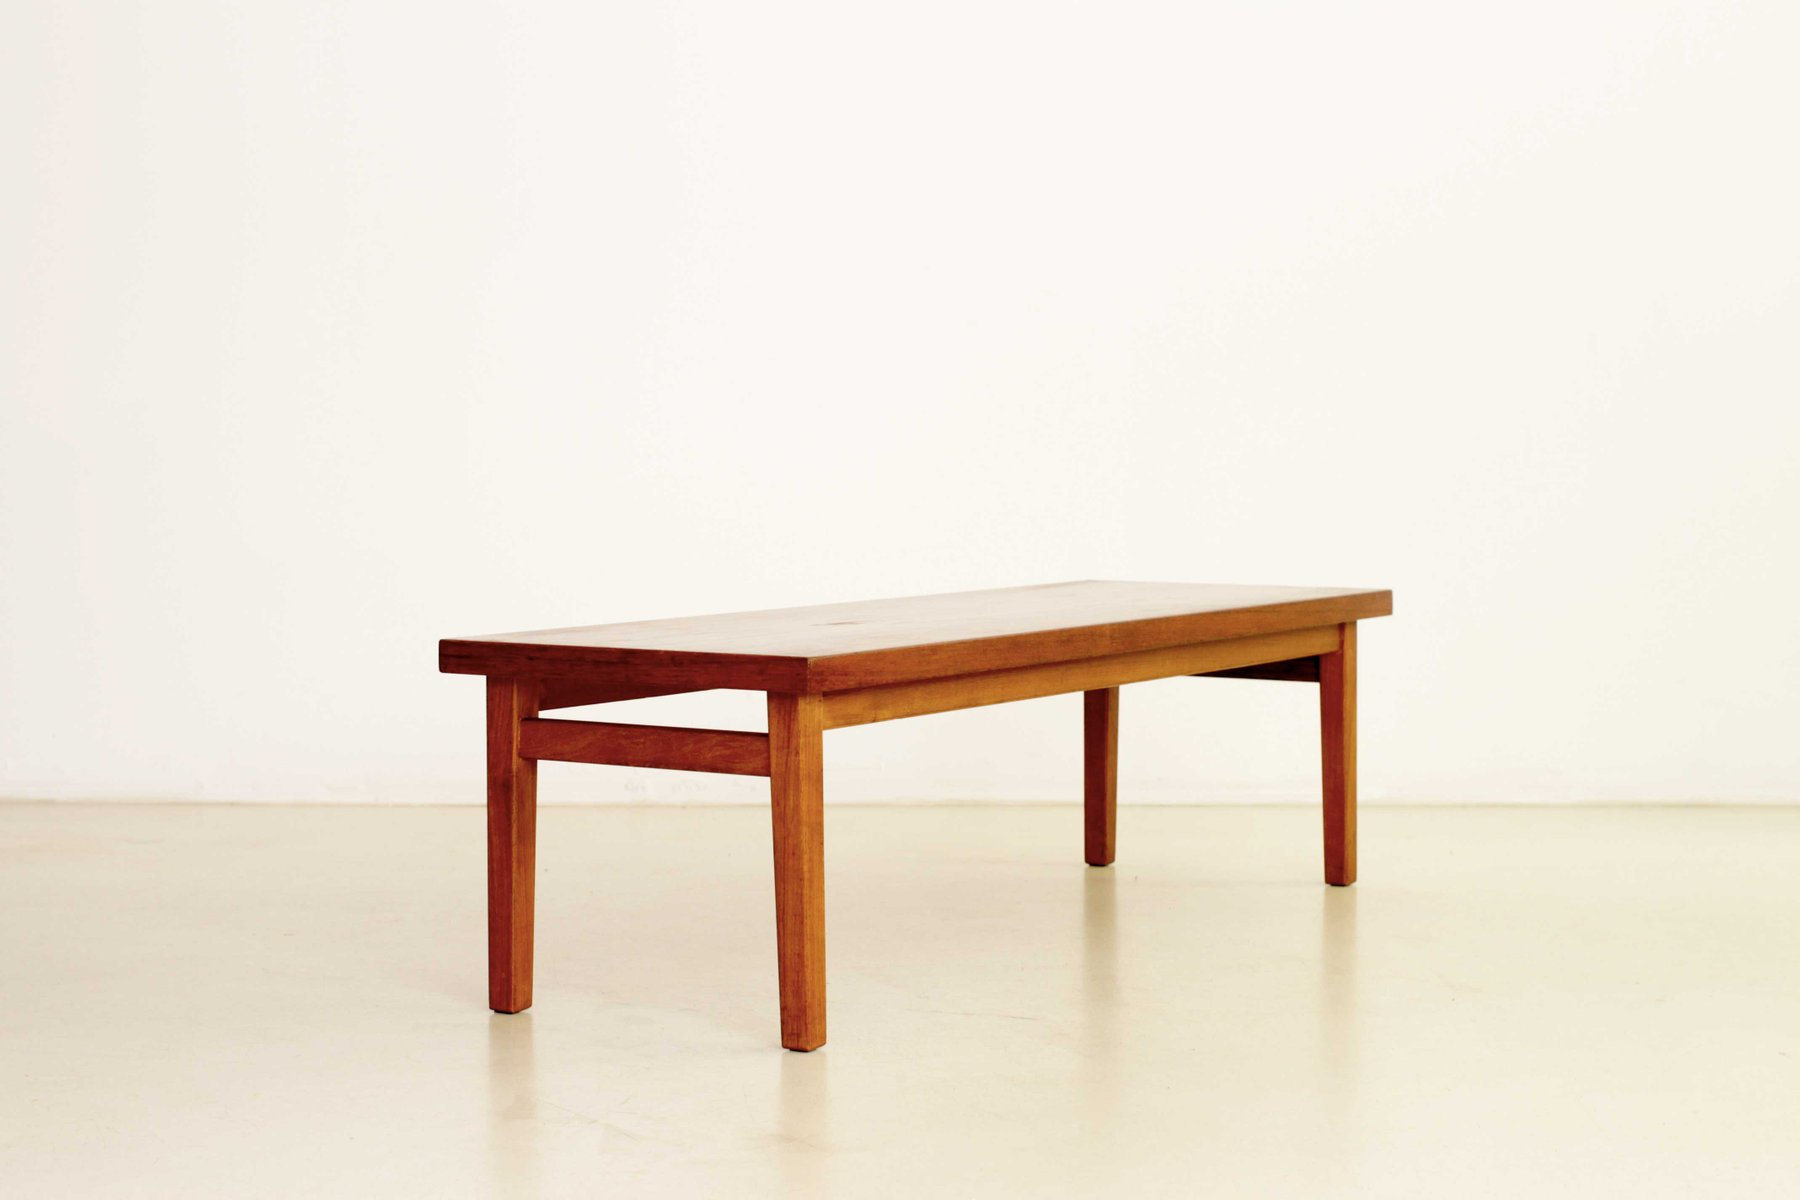 Rectangular Scandinavian Teak Coffee Table 1950s for sale at Pamono